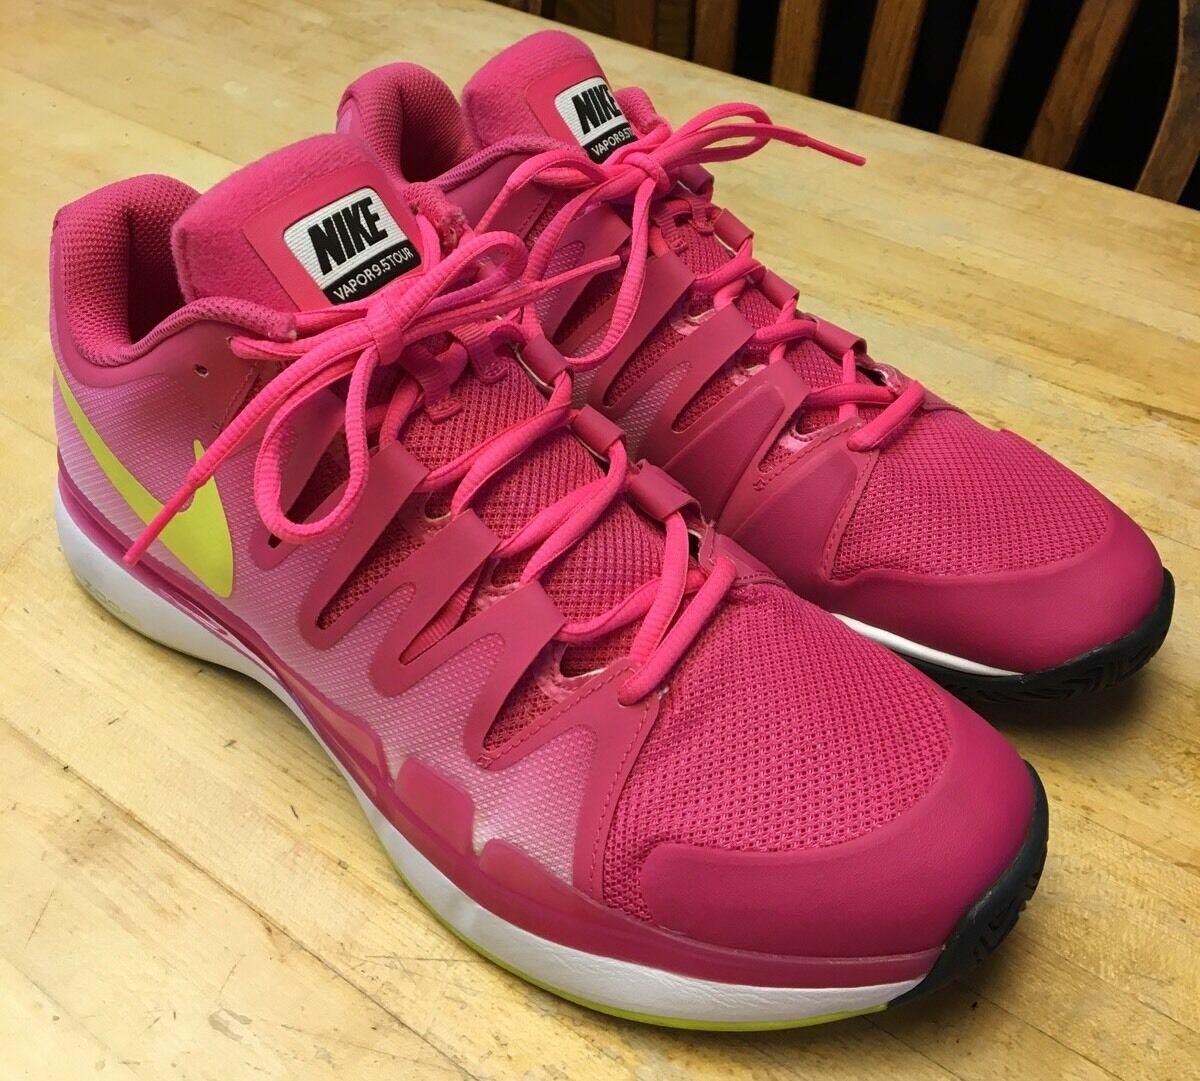 Womens Nike Zoom Vapor 9.5 Tour Tennis Shoes 631475-676 Size 11 1/2 (Worn Twice)